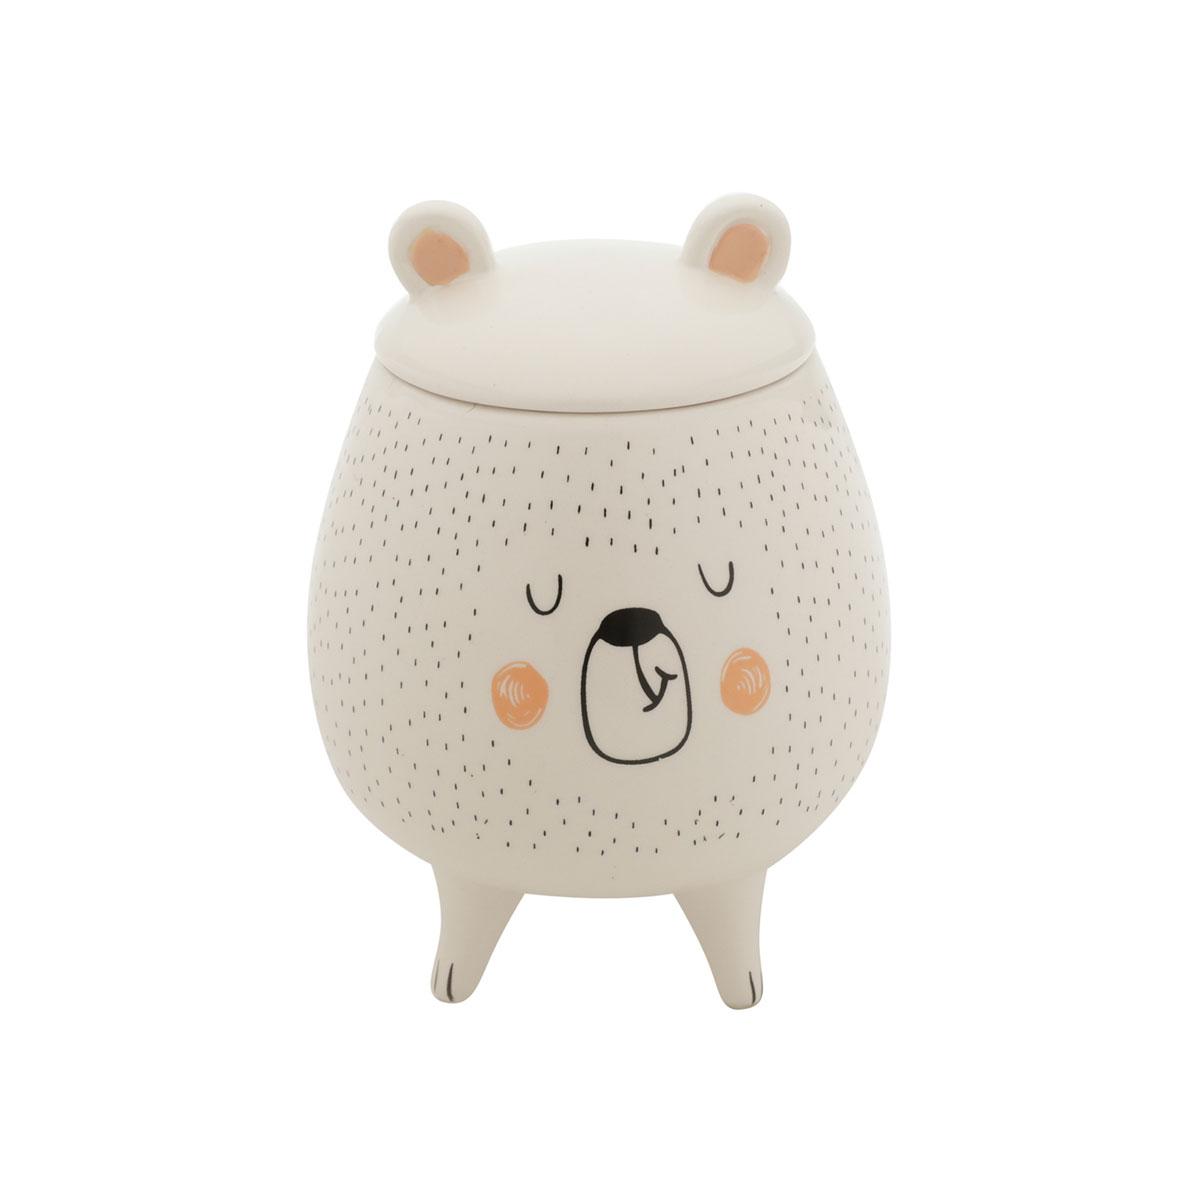 Vaso Potiche Decorativo Cerâmica Urso Sleeping Bear - Presente Super